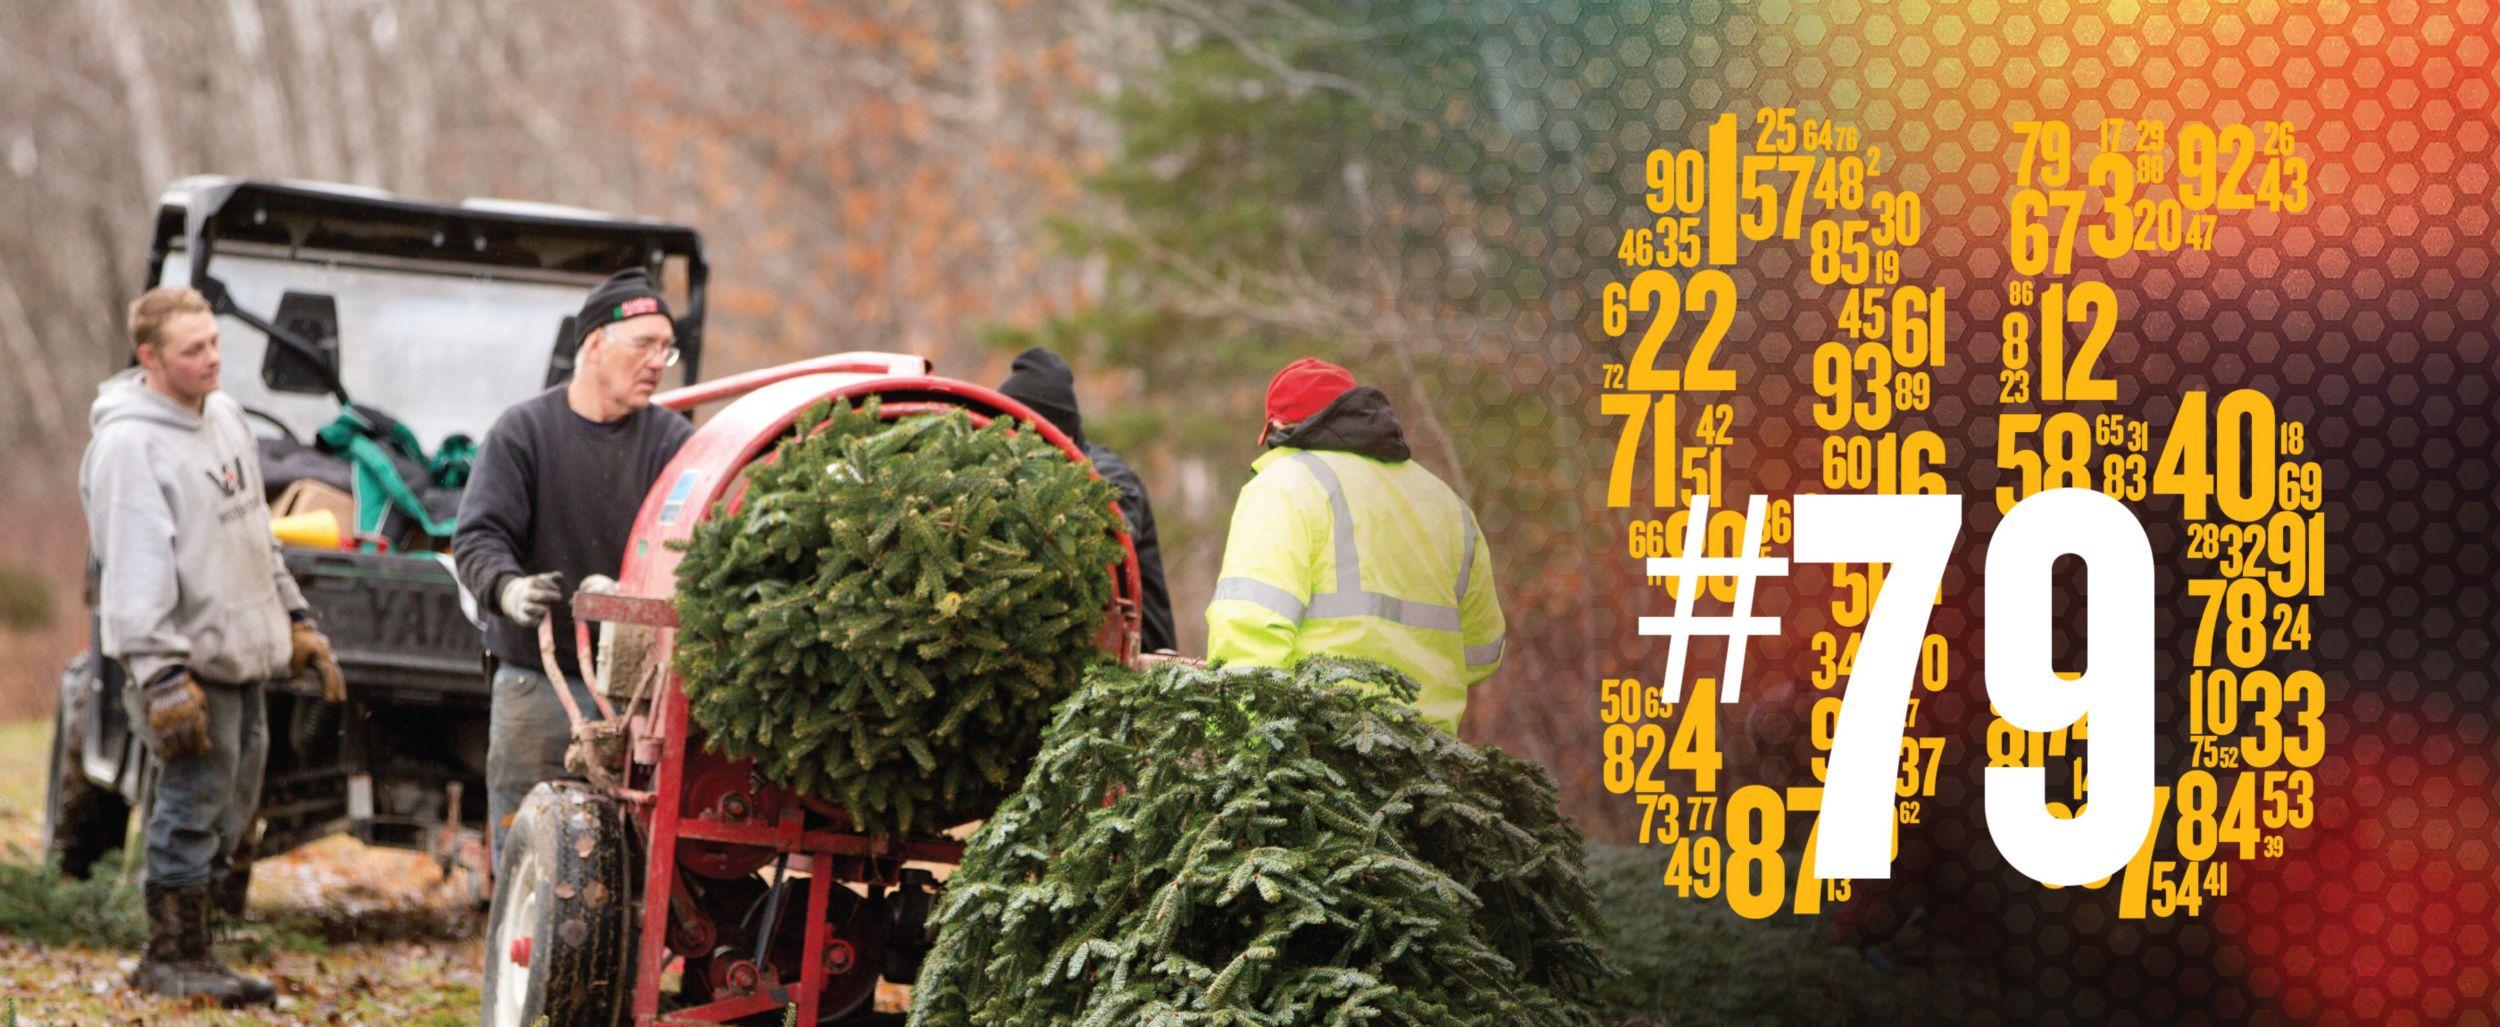 Allagash View Christmas Tree Farm in Maine